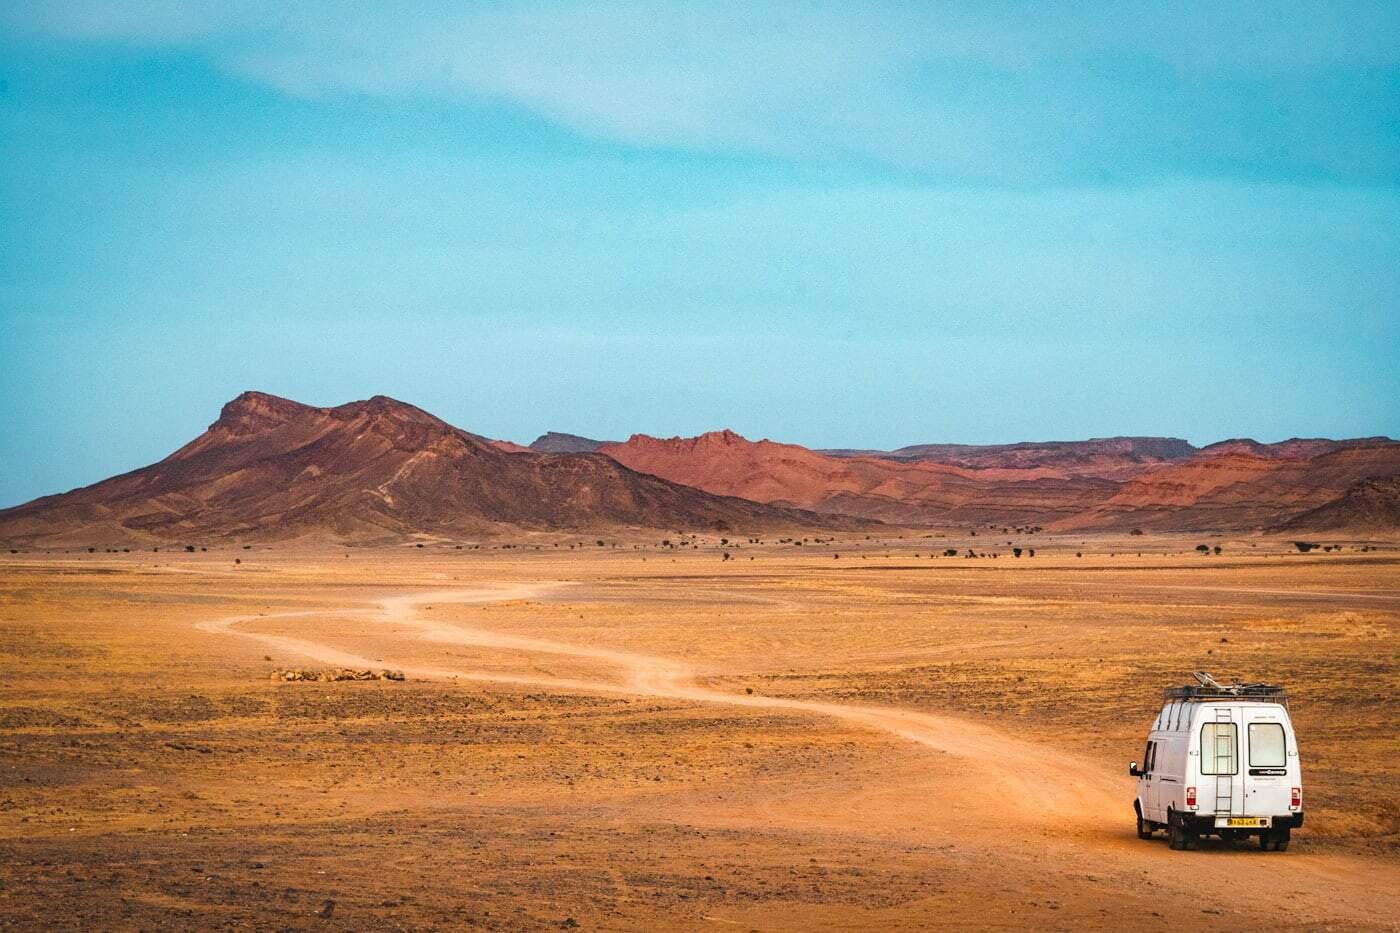 Campervan travelling in Morocco in the desert